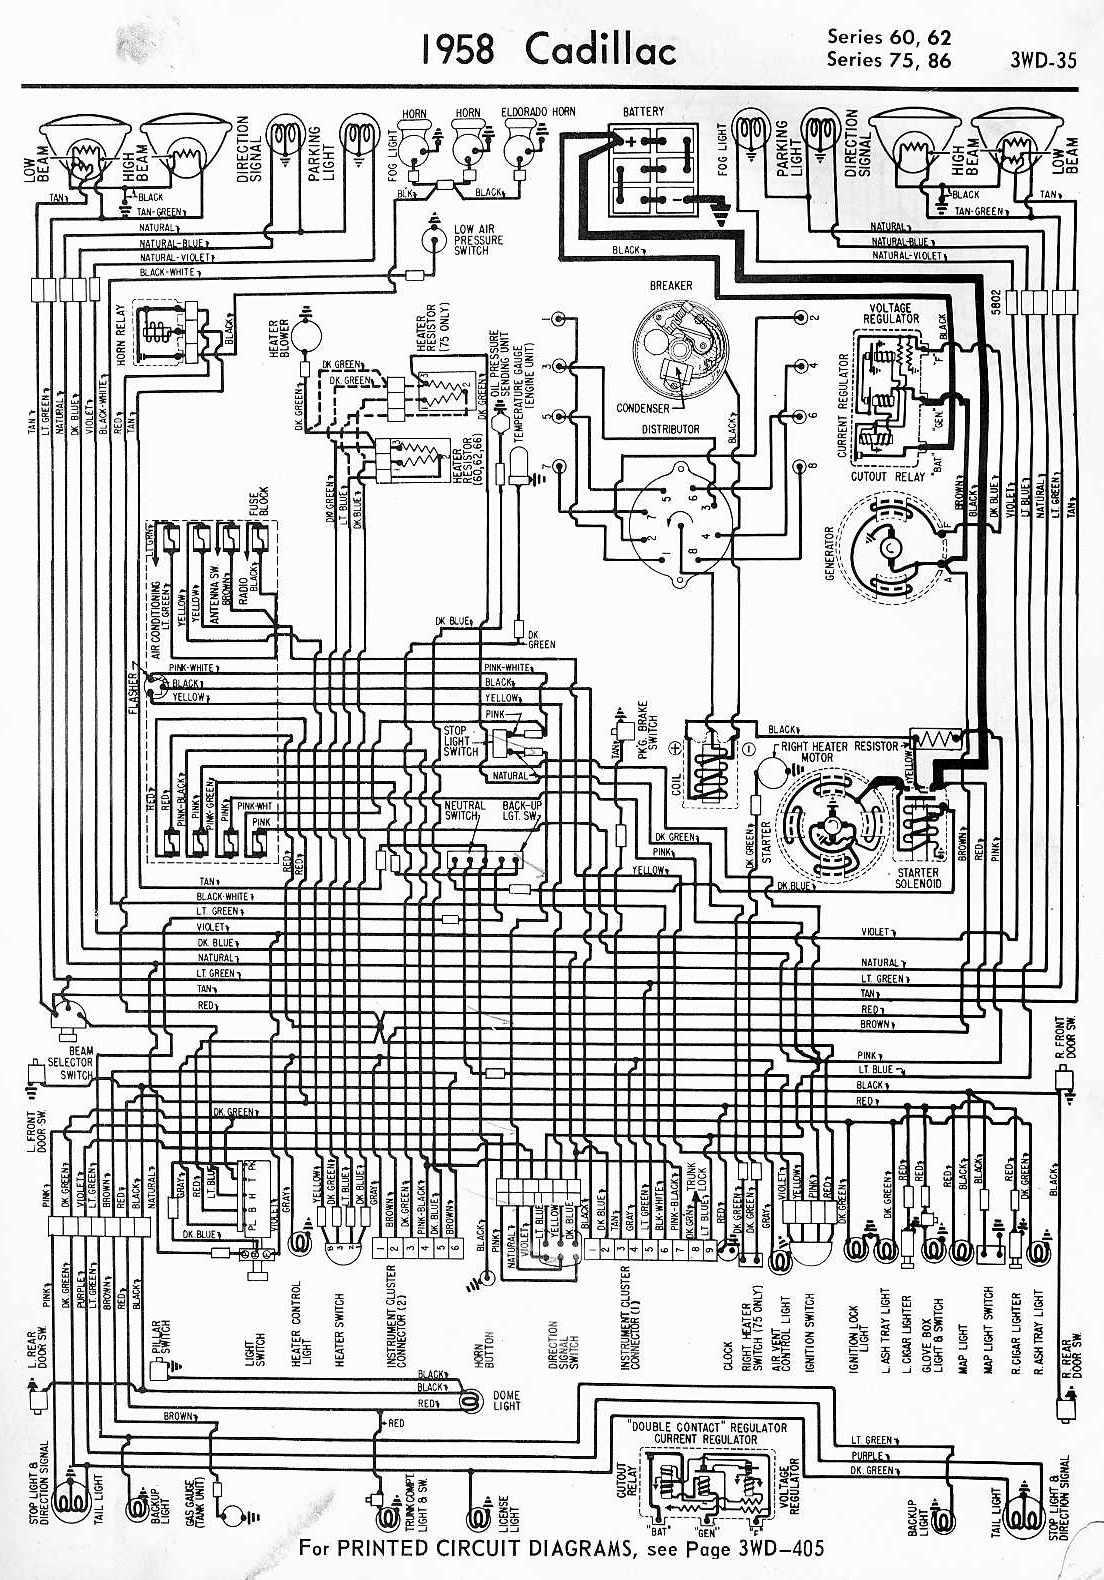 hight resolution of 1968 cadillac air conditioner wiring diagram simple wiring schema 1994 cadillac deville speaker wiring diagram 1979 cadillac deville wiring diagram